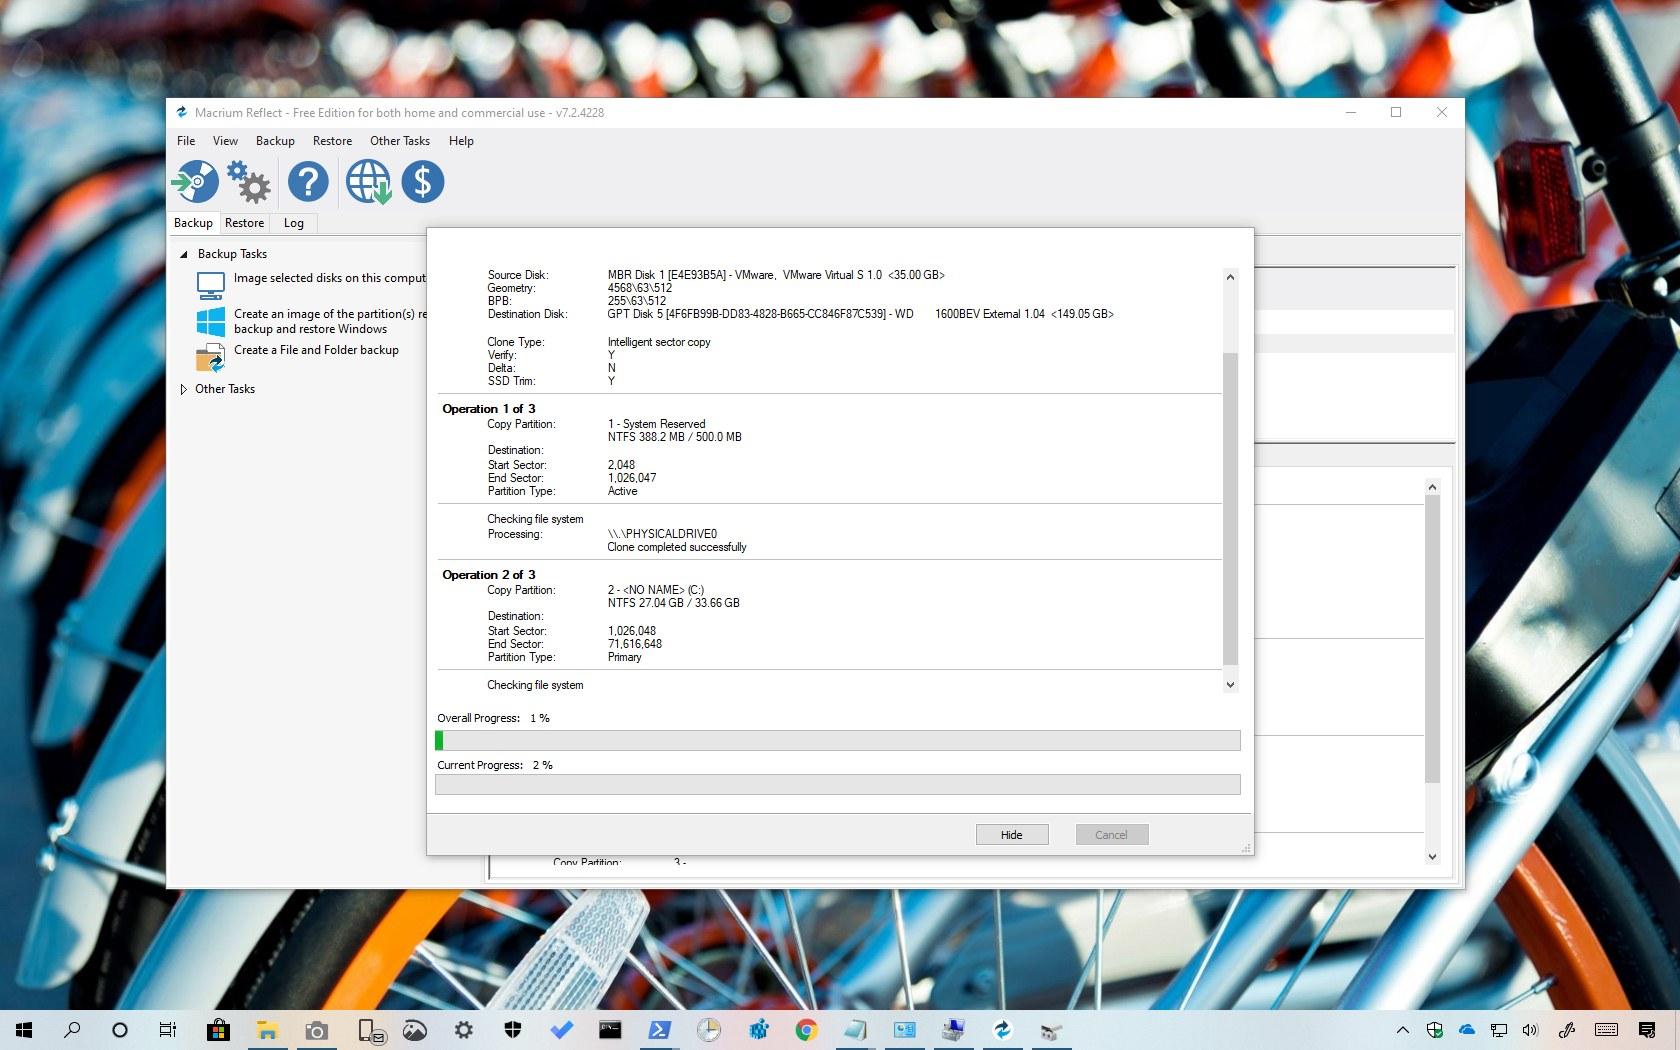 Clone drive using Macrium Reflect on Windows 10